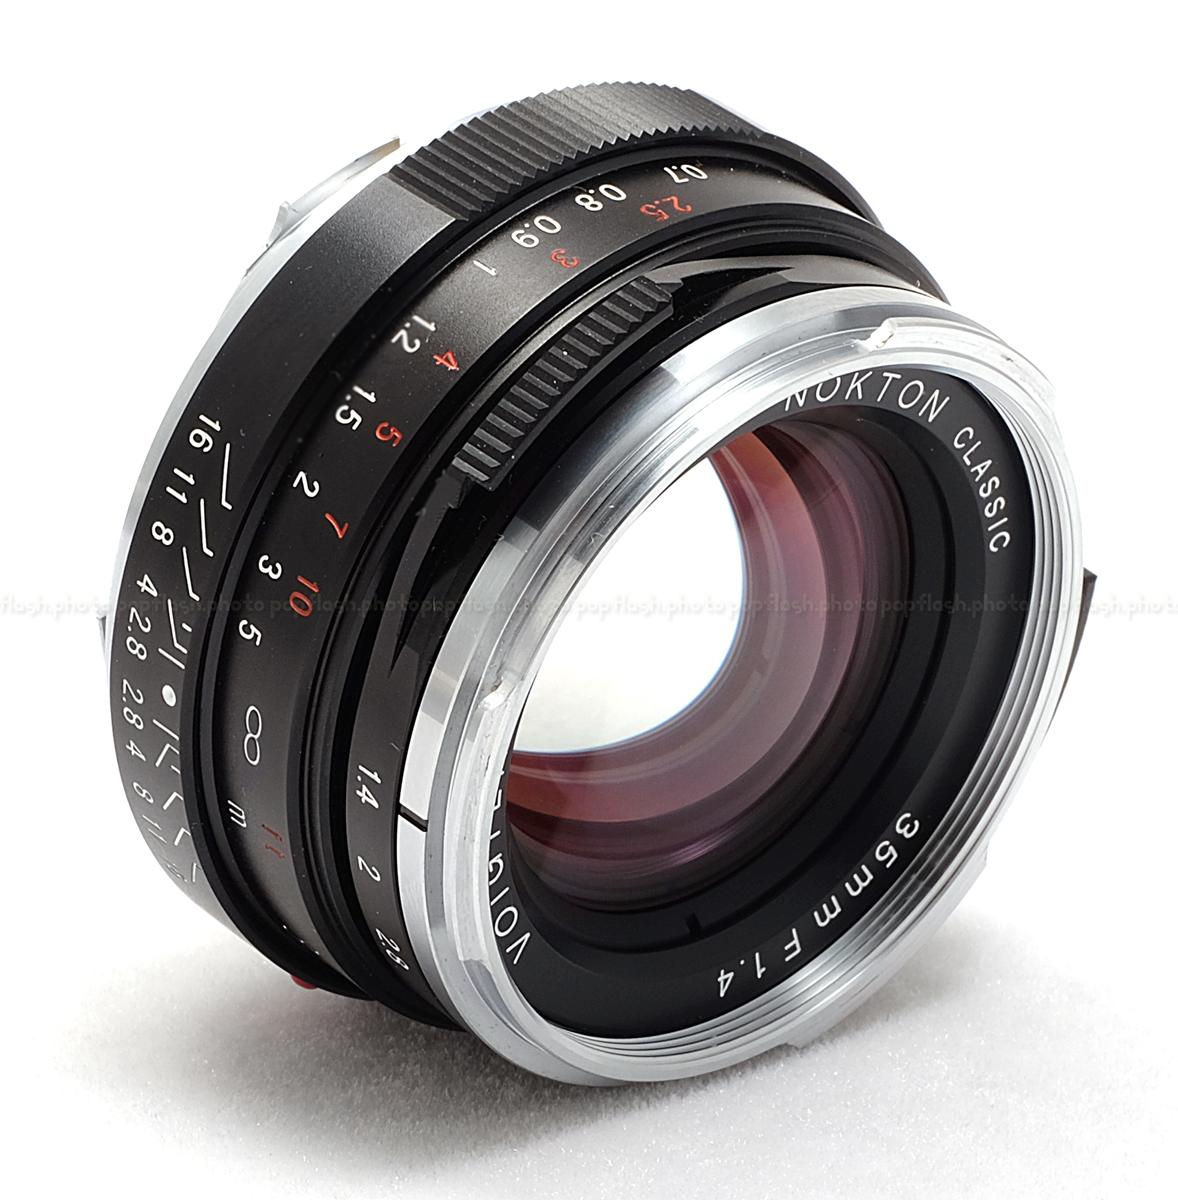 Voigtlander 35mm F 1 4 Mc Nokton Leica M Mount Lens New